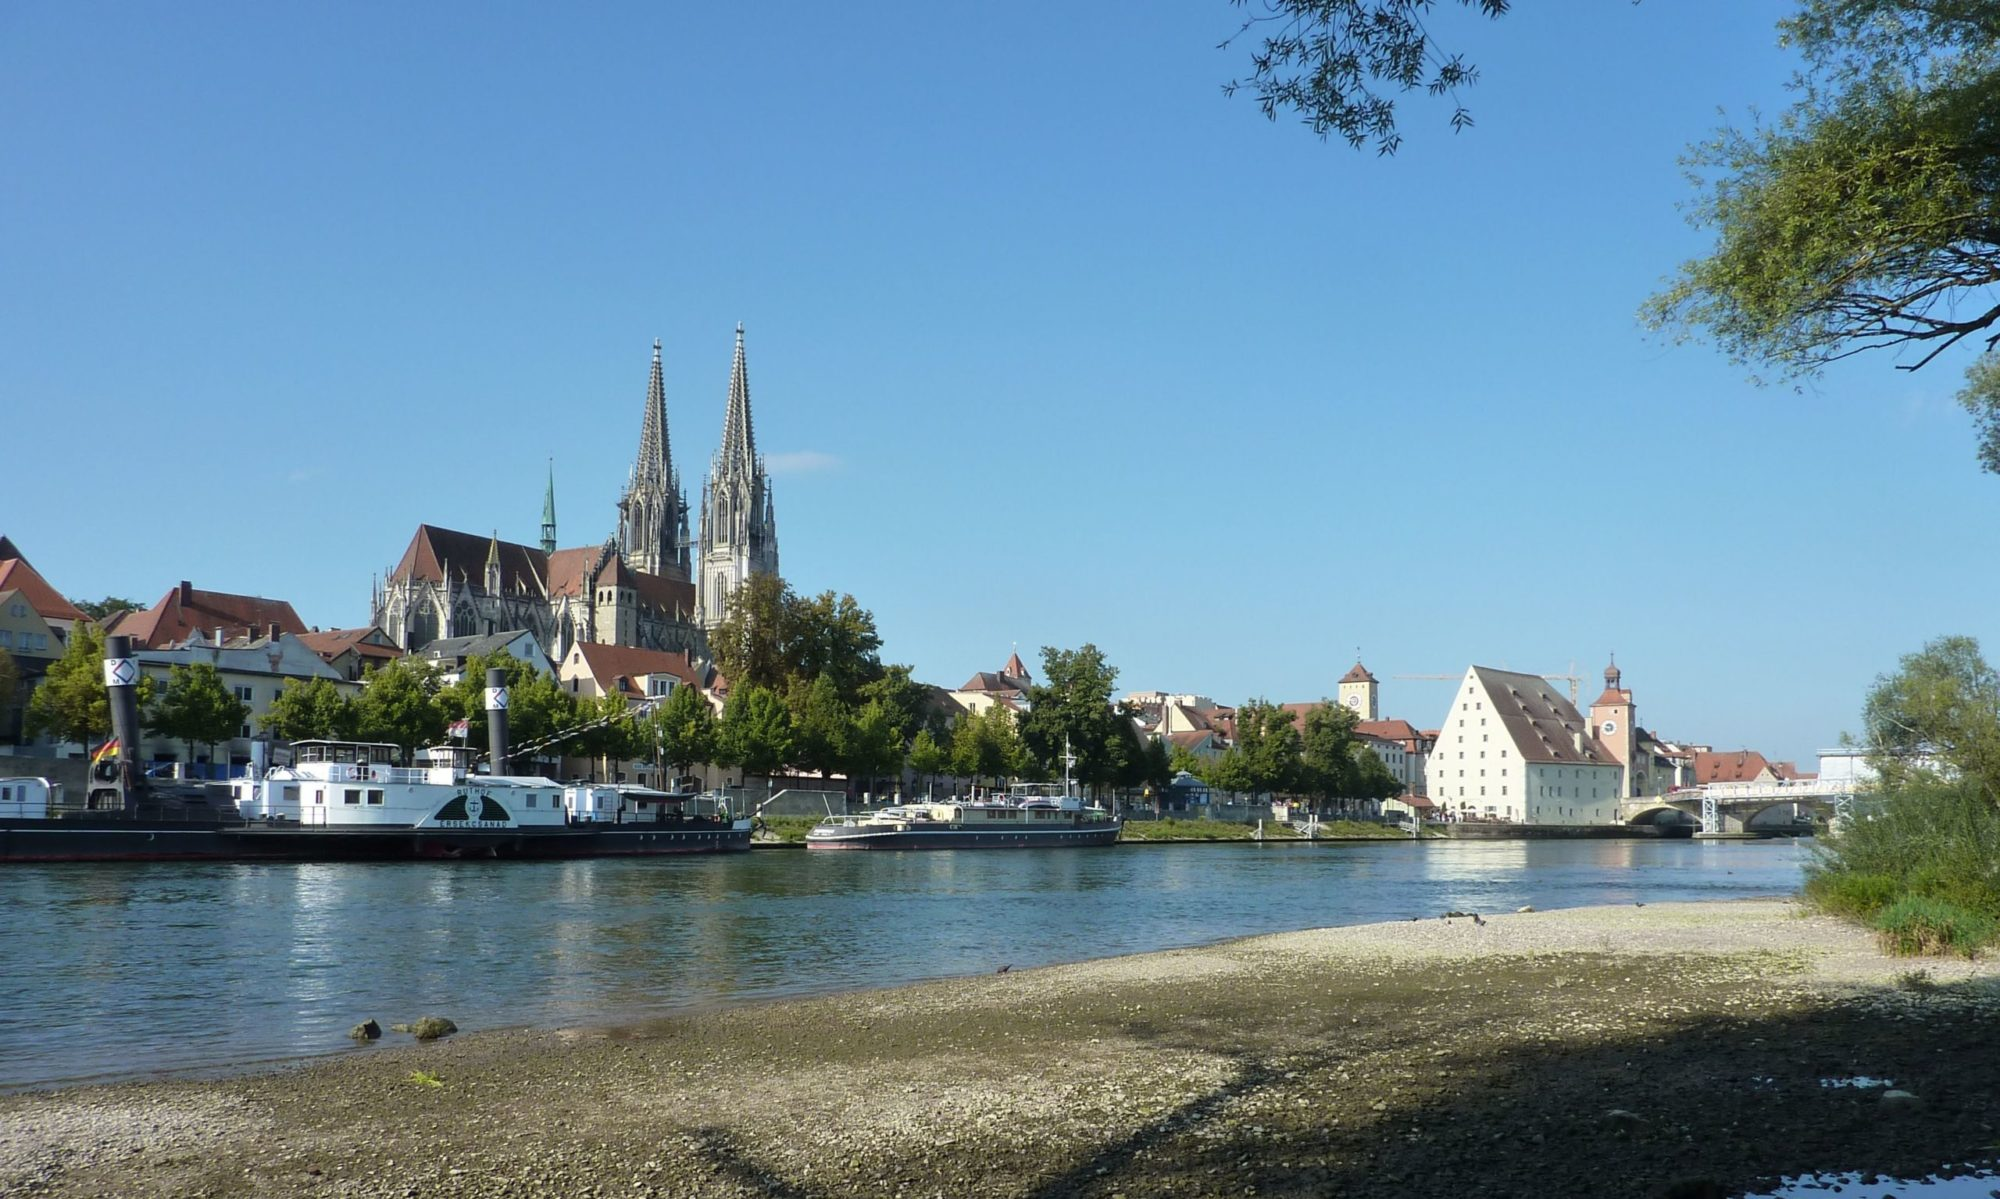 Regensburger Fremdsprachenschule